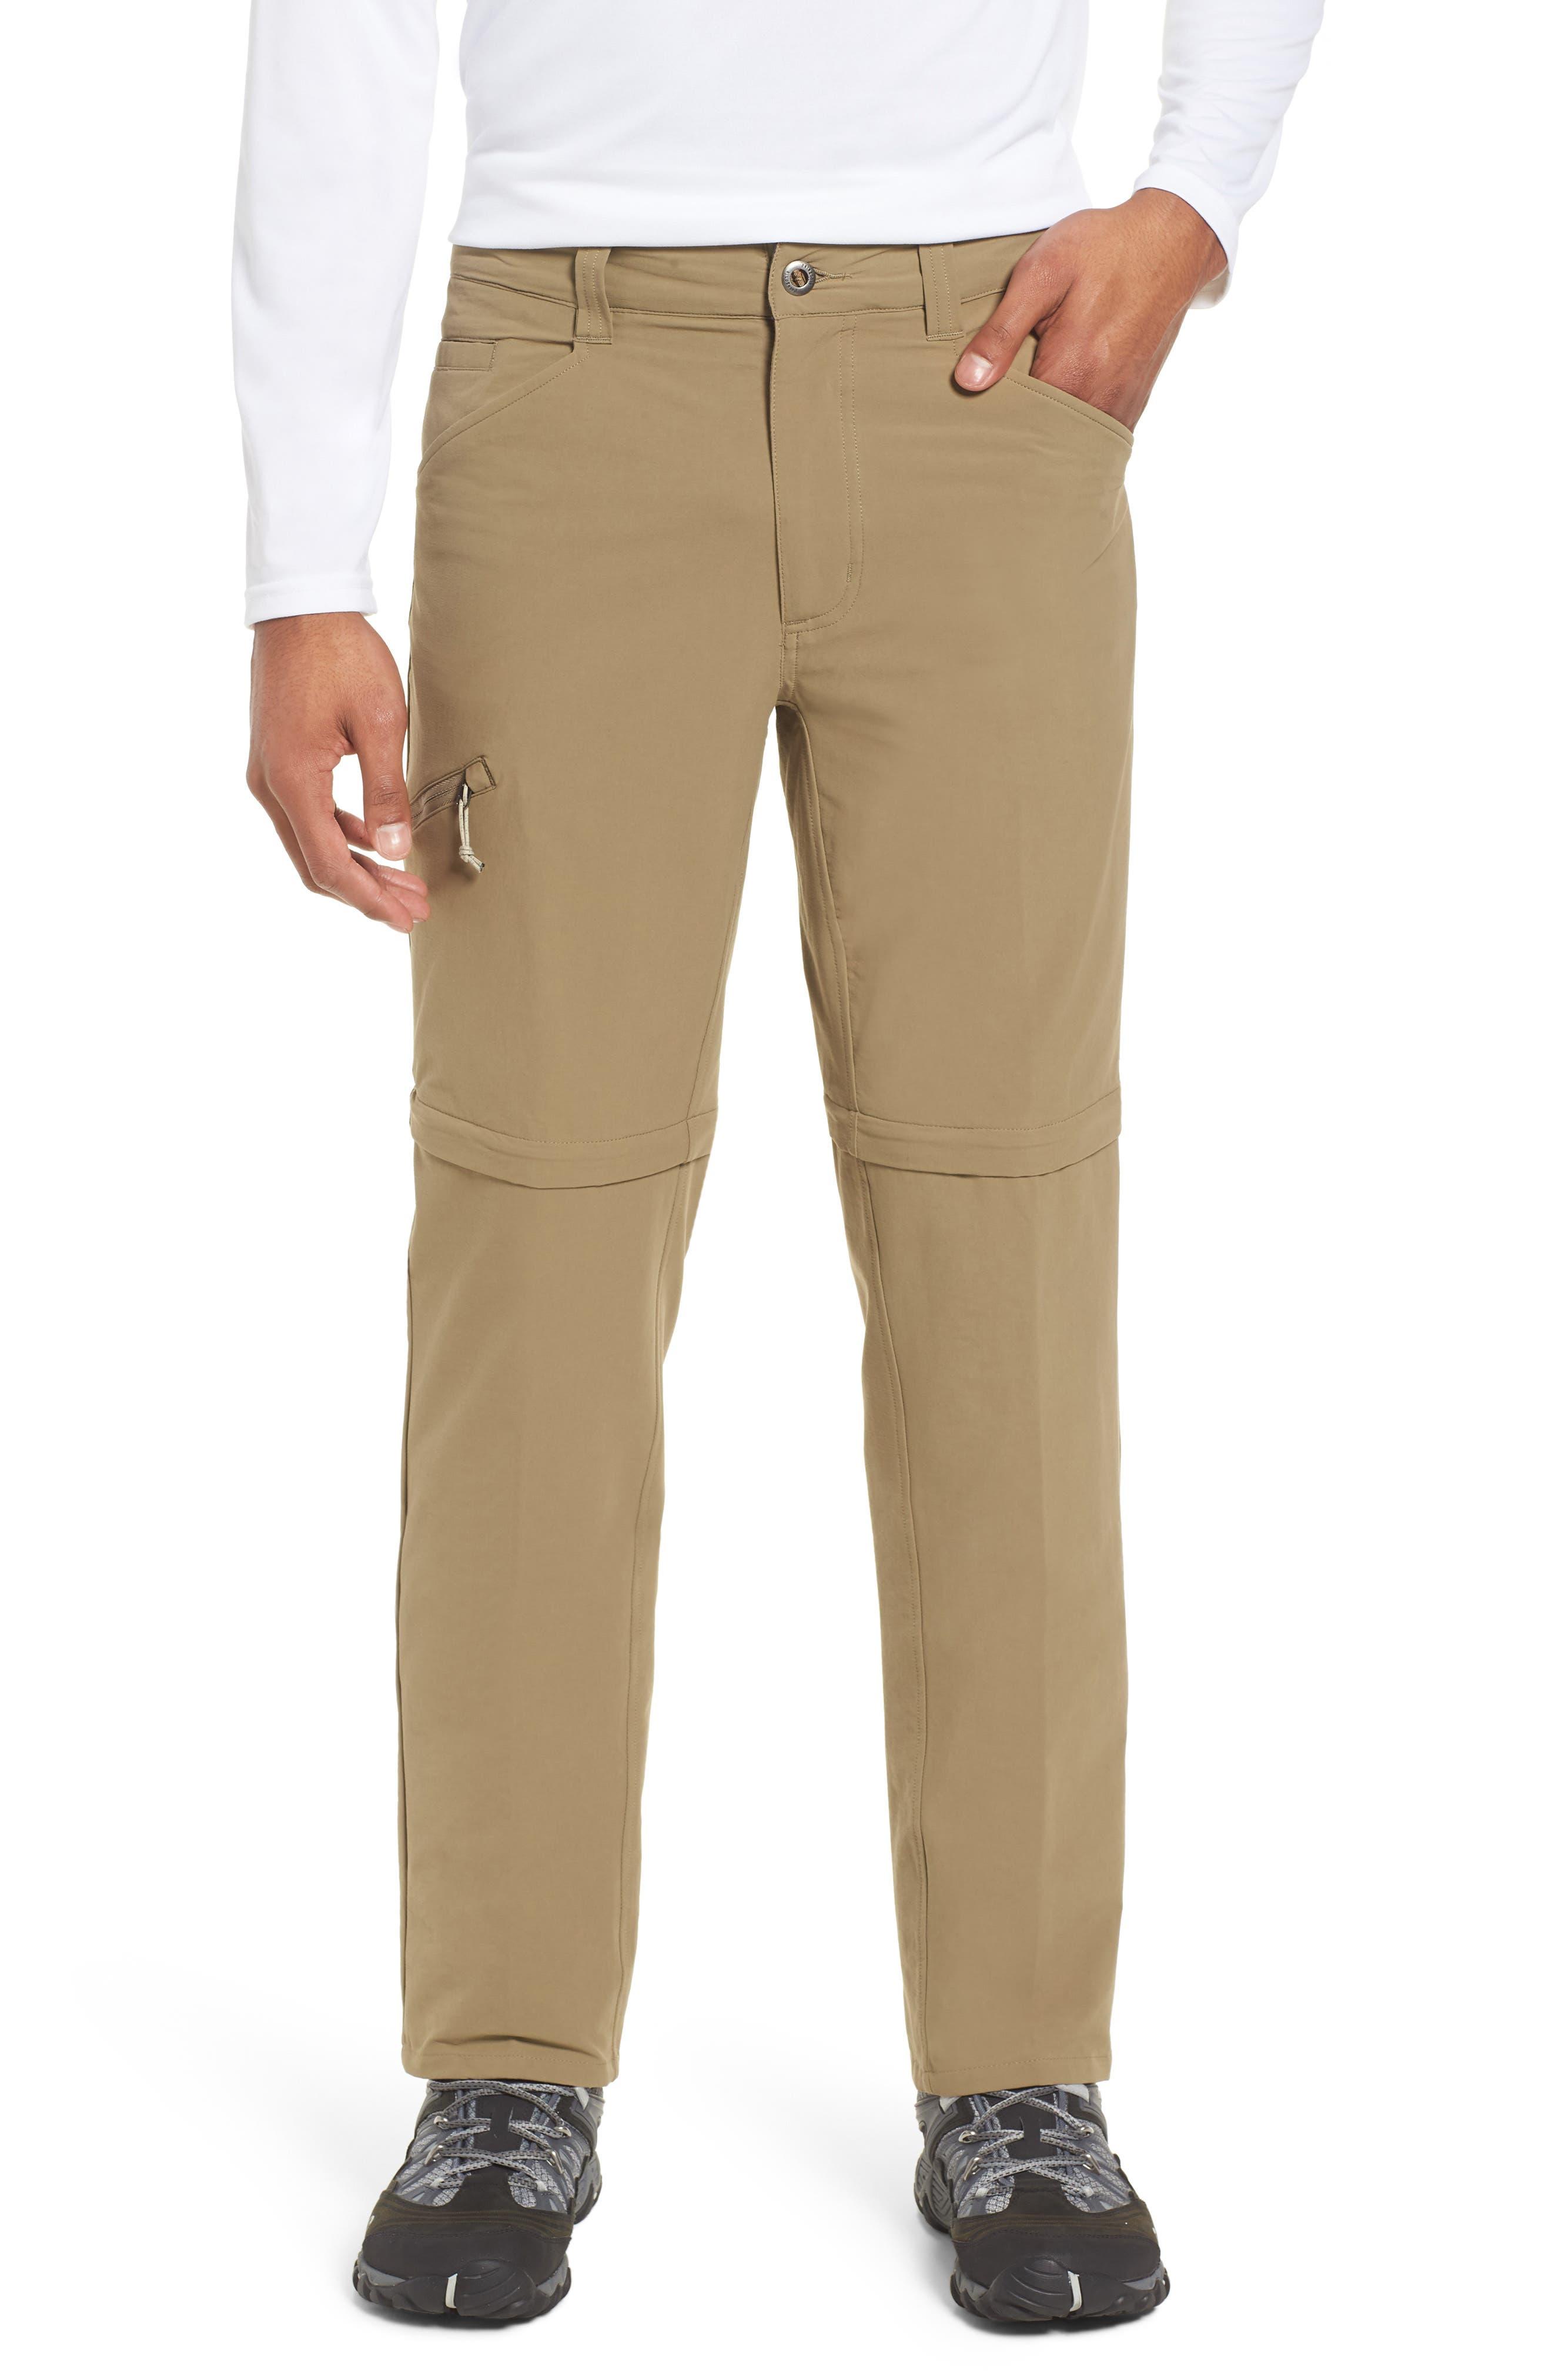 M's Quandry Convertible Pants,                             Main thumbnail 1, color,                             ASH TAN